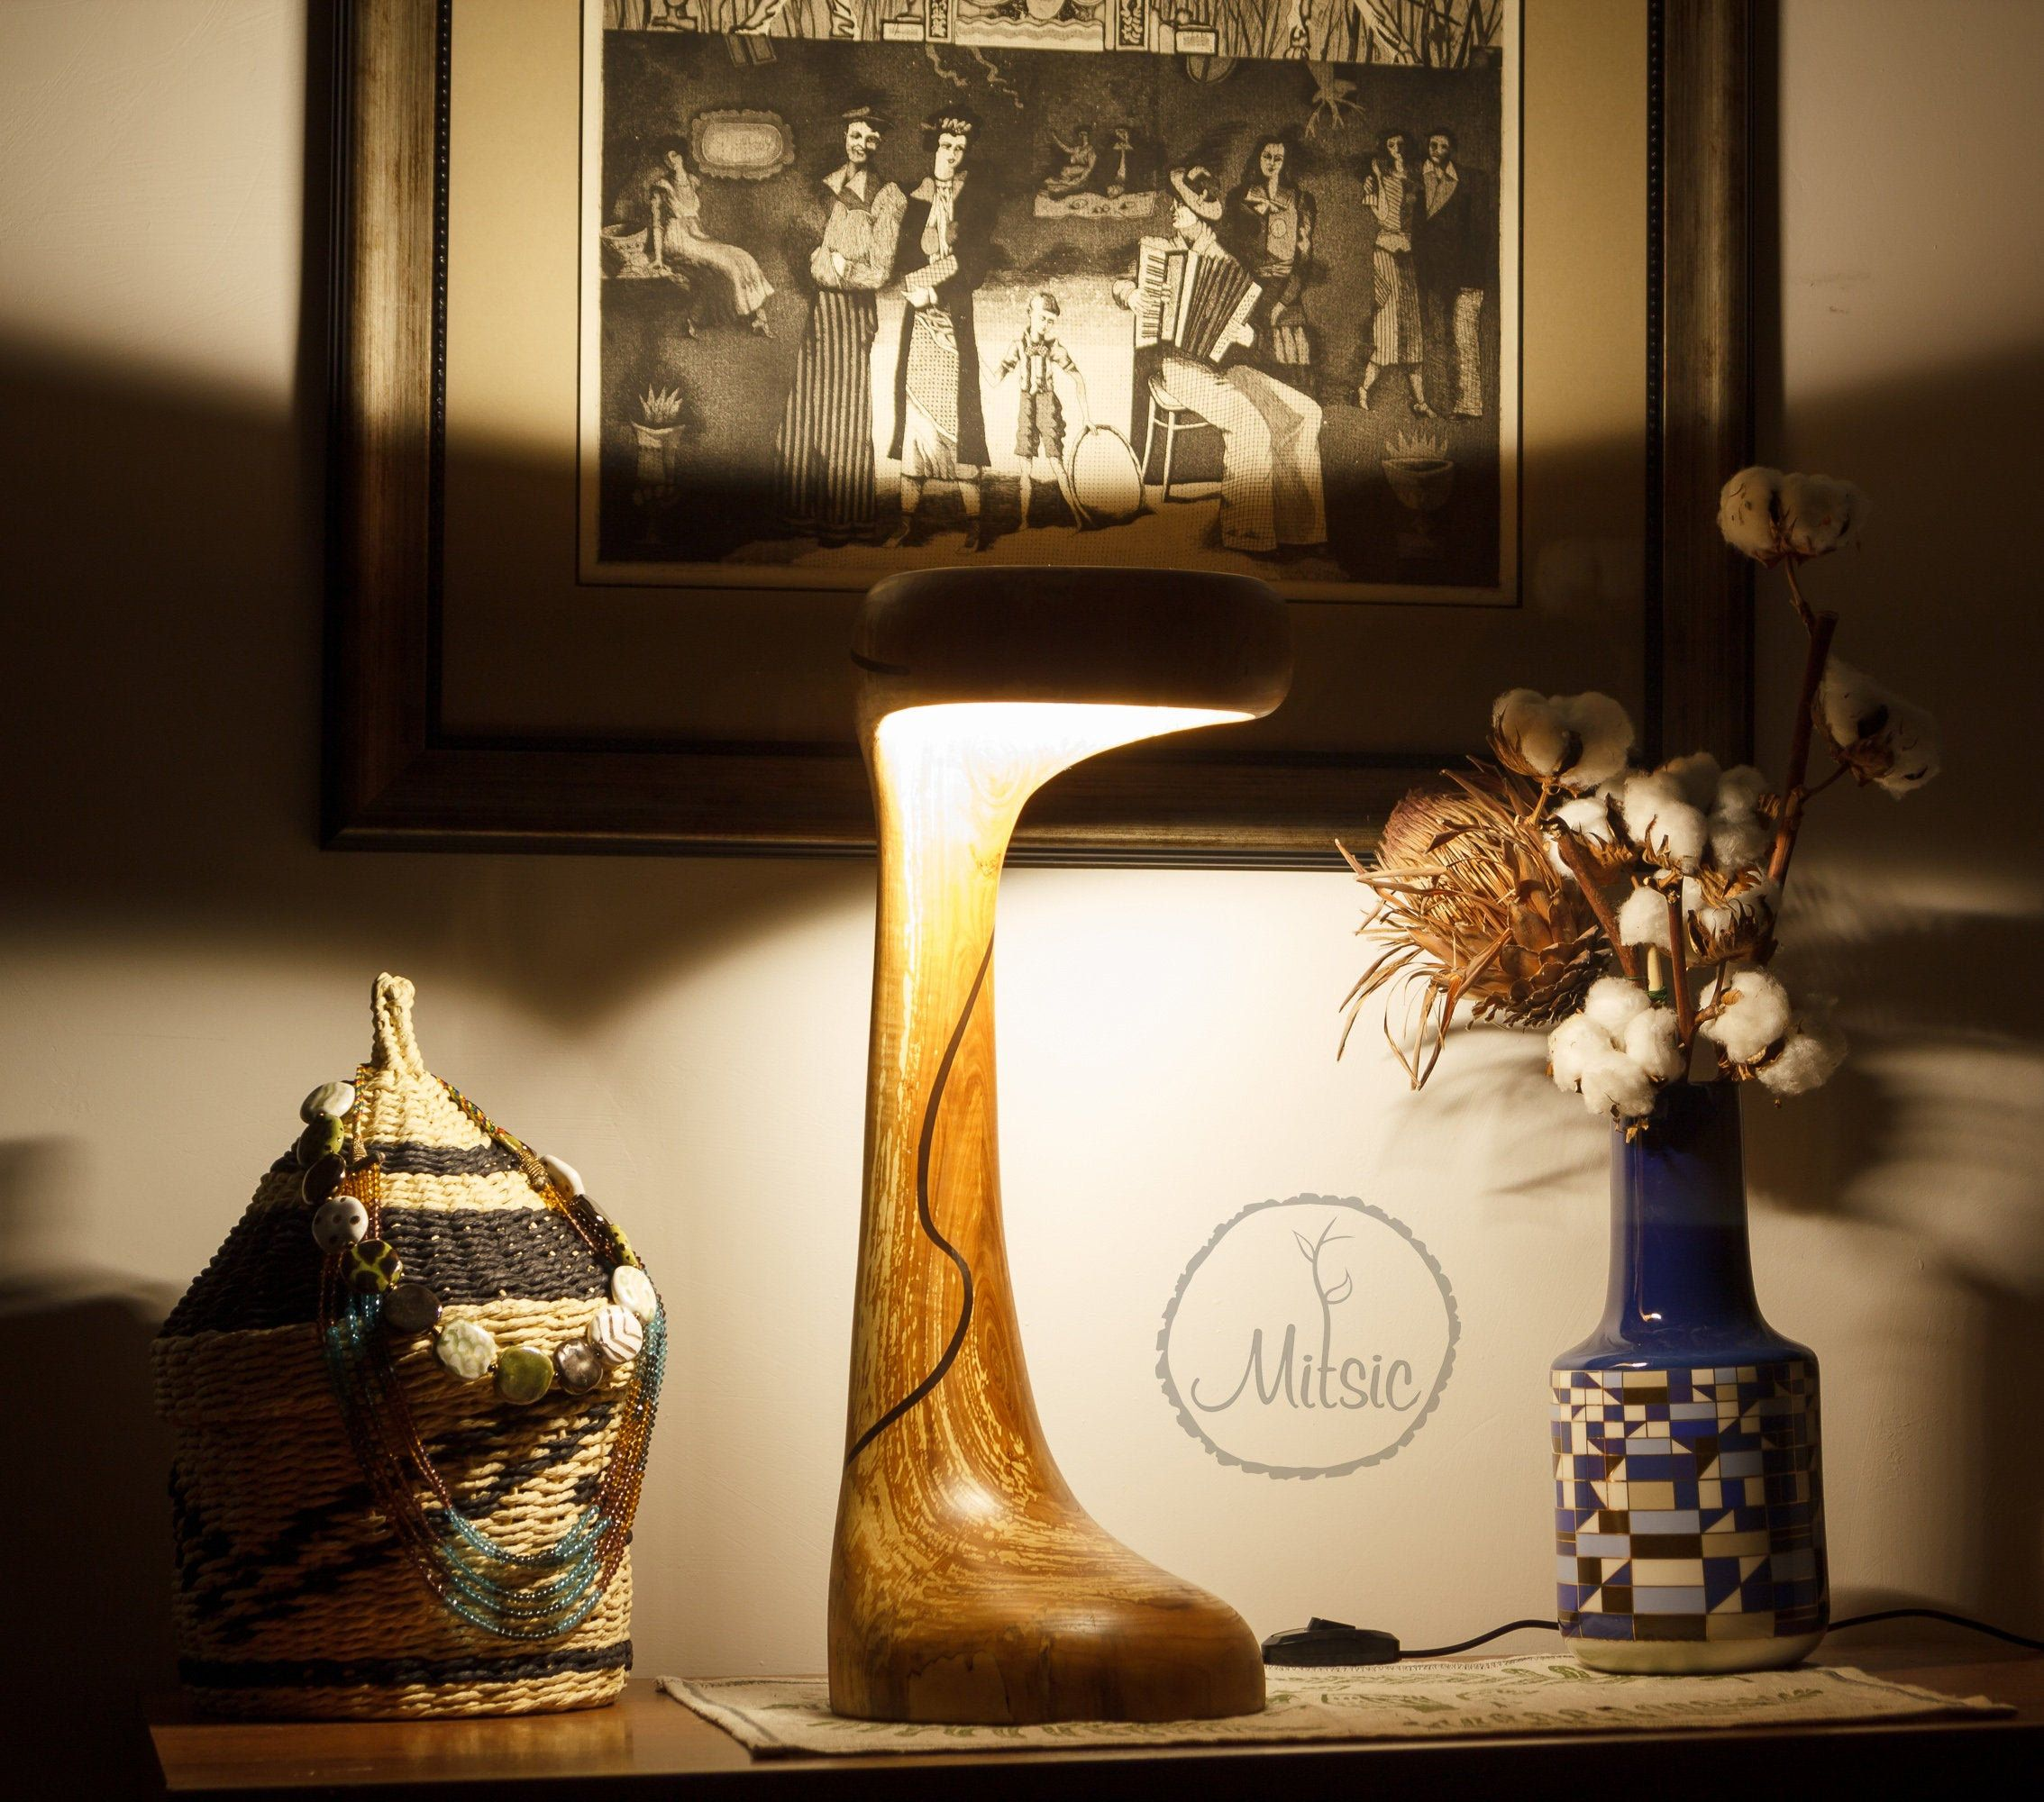 Wooden LED lamp. Tree branch lamp. Natural wood lighting